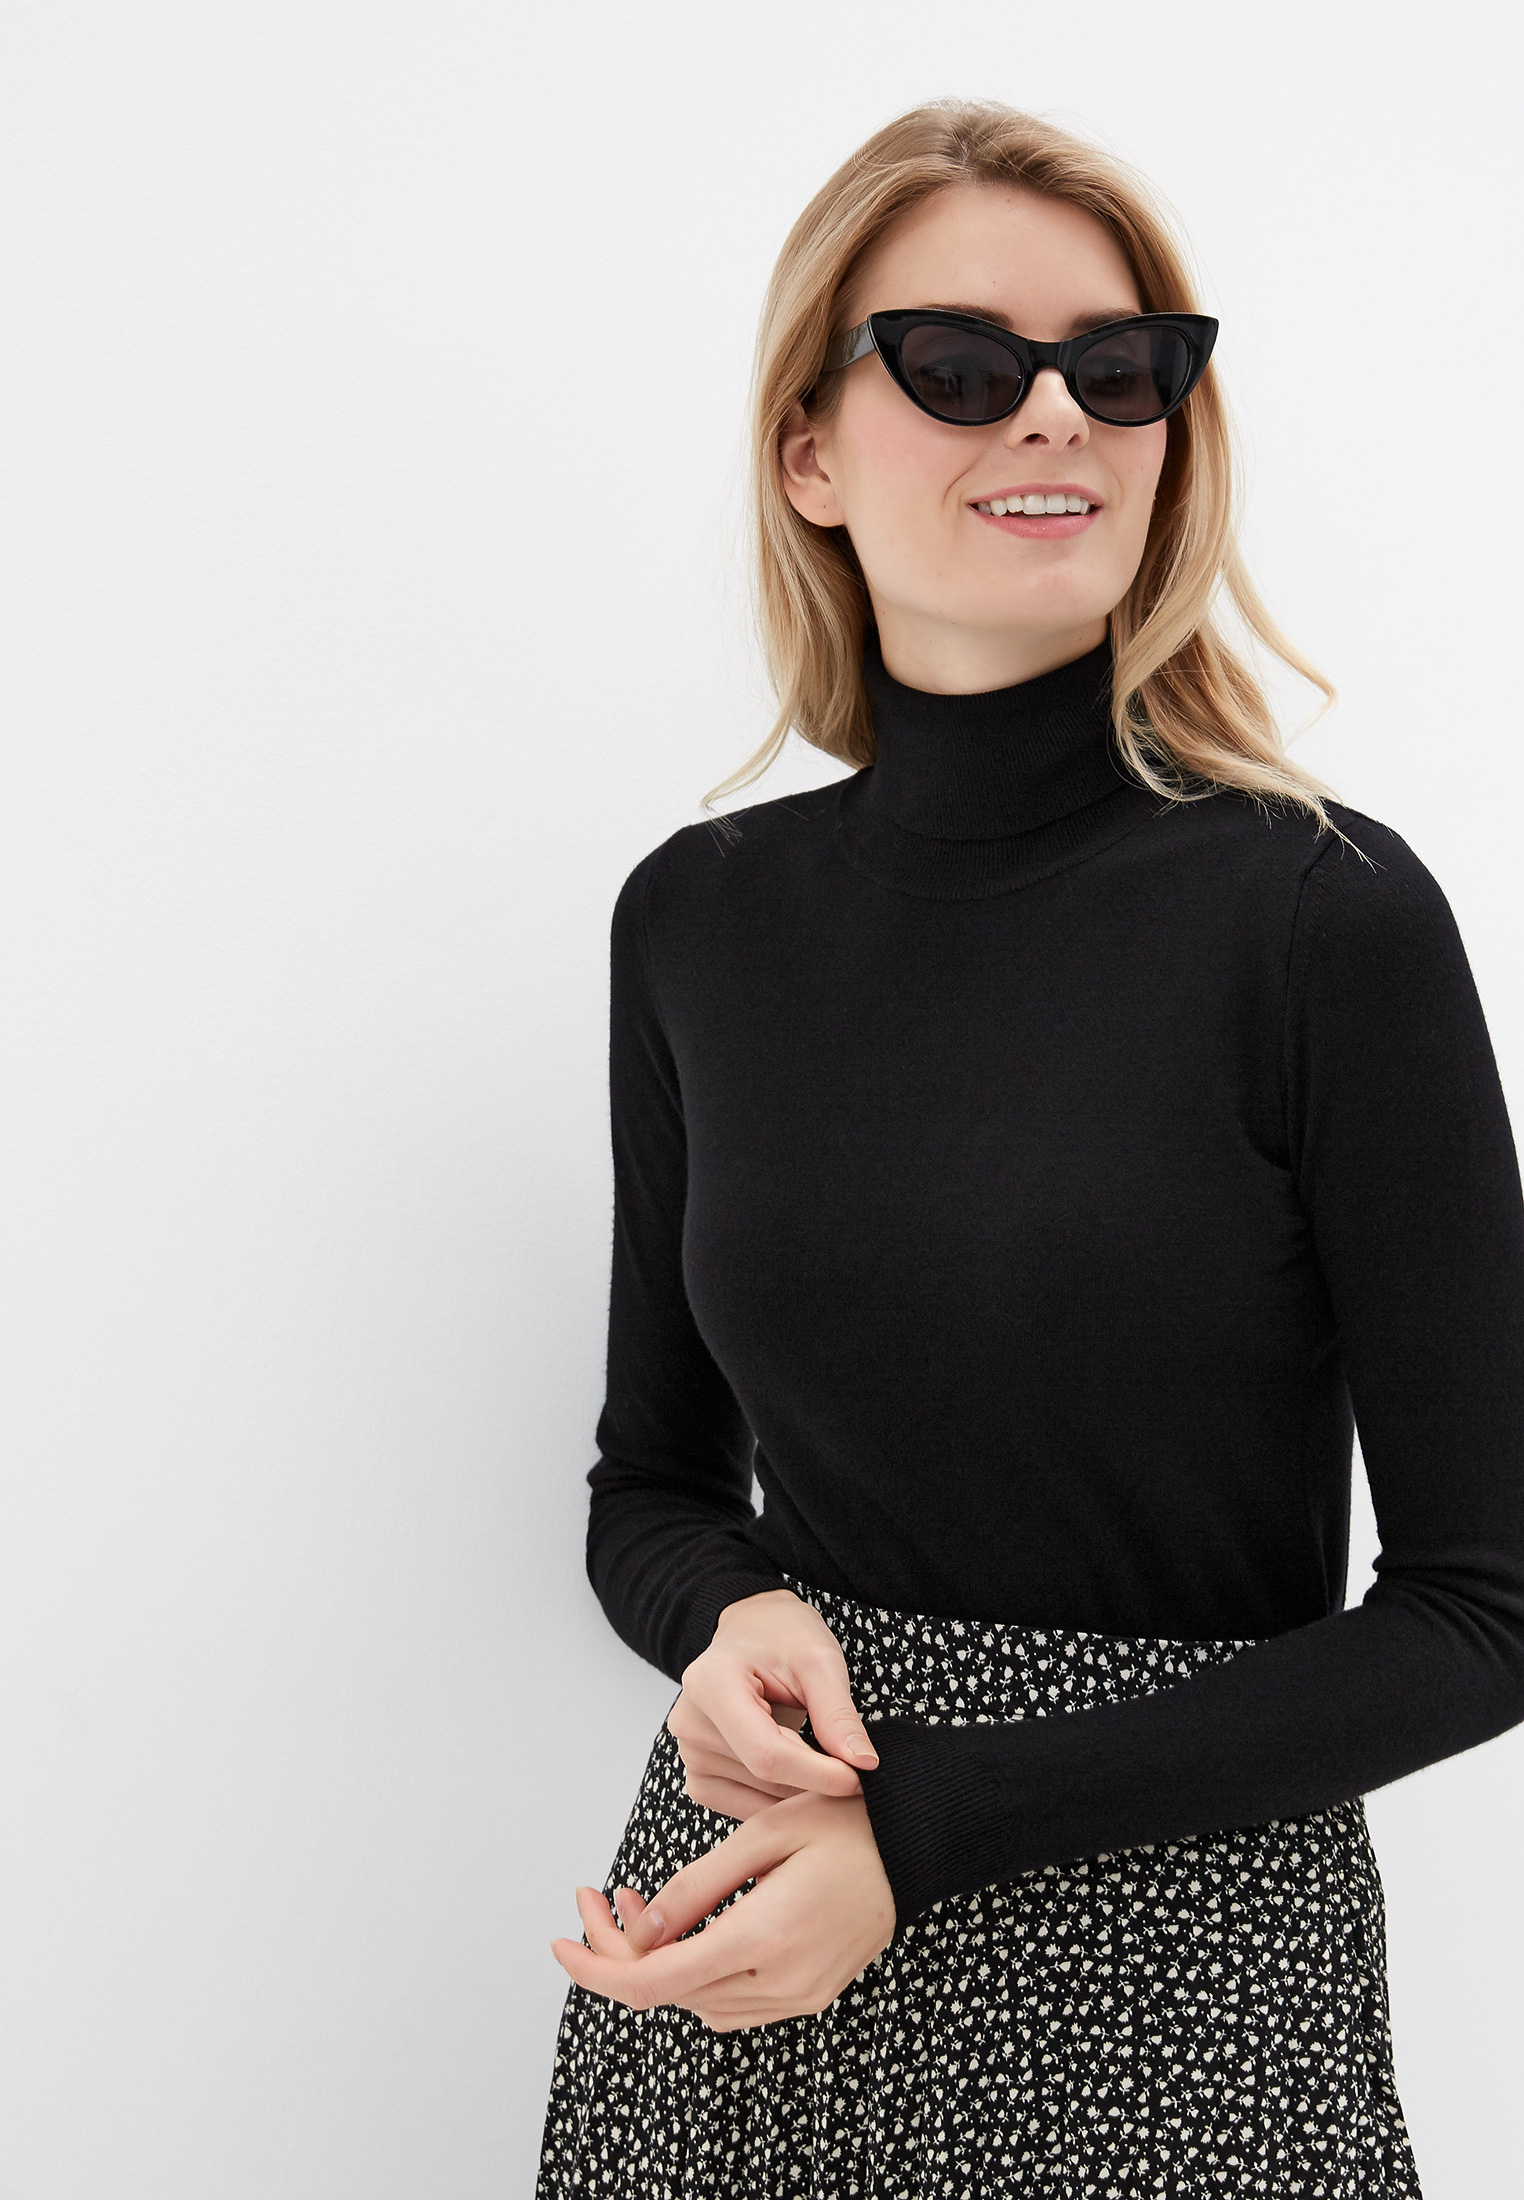 Водолазка, Rinascimento, цвет: черный. Артикул: RI005EWGAZU8. Одежда / Джемперы, свитеры и кардиганы